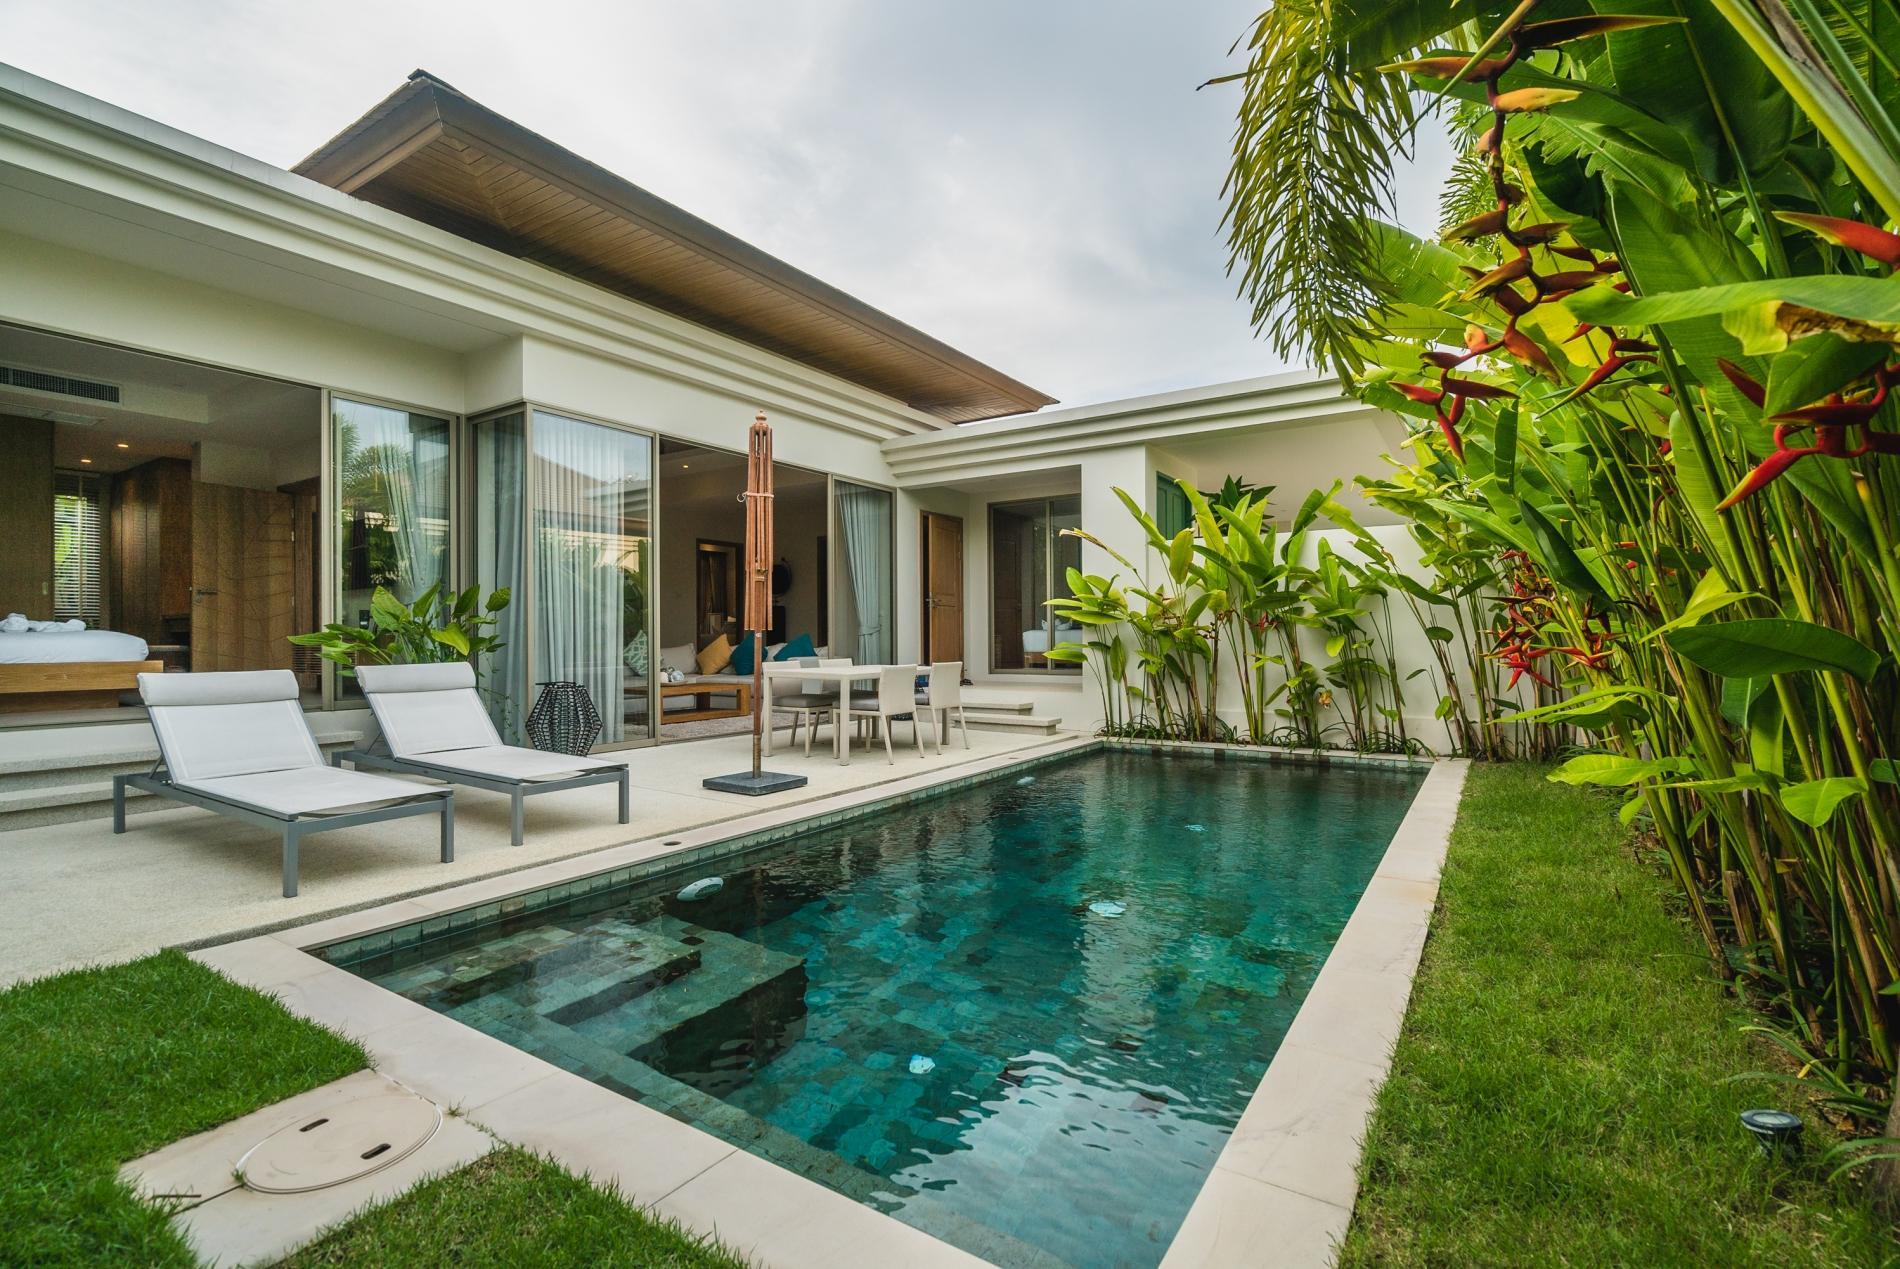 Apartment Trichada 18 - Private pool modern 3 bedroom villa photo 18771827